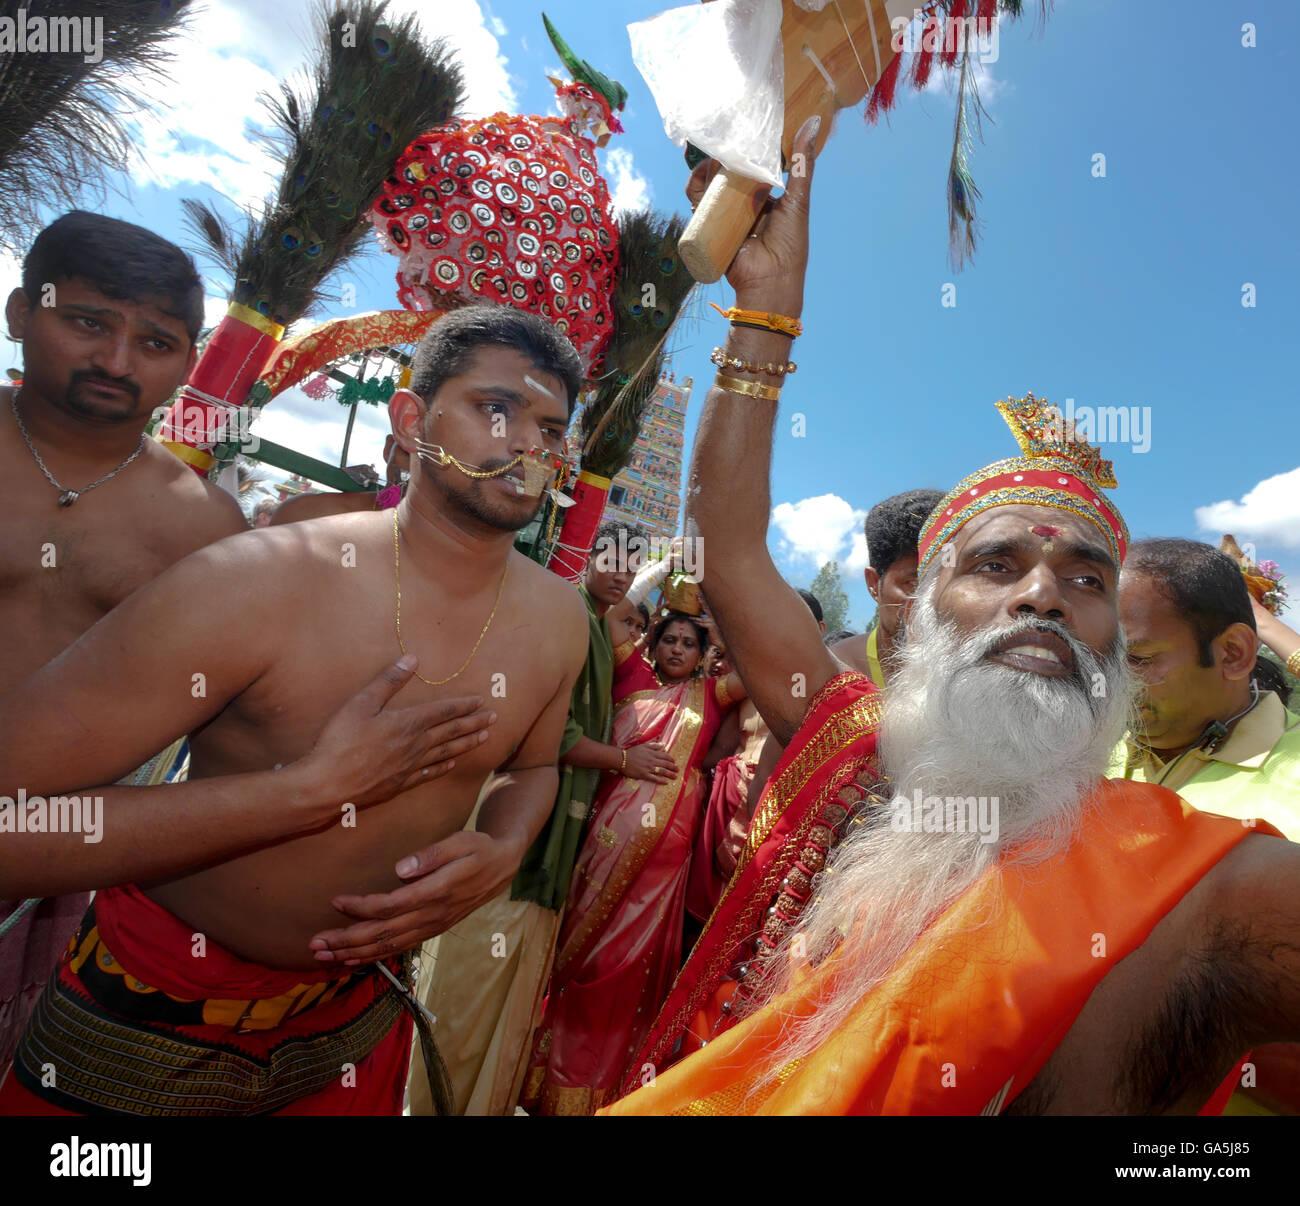 Priest Siva Sri Arumugam Paskarakurukka blesses the Kavadi dancers, Kavadi dancers with by maltreated cheeks during - Stock Image